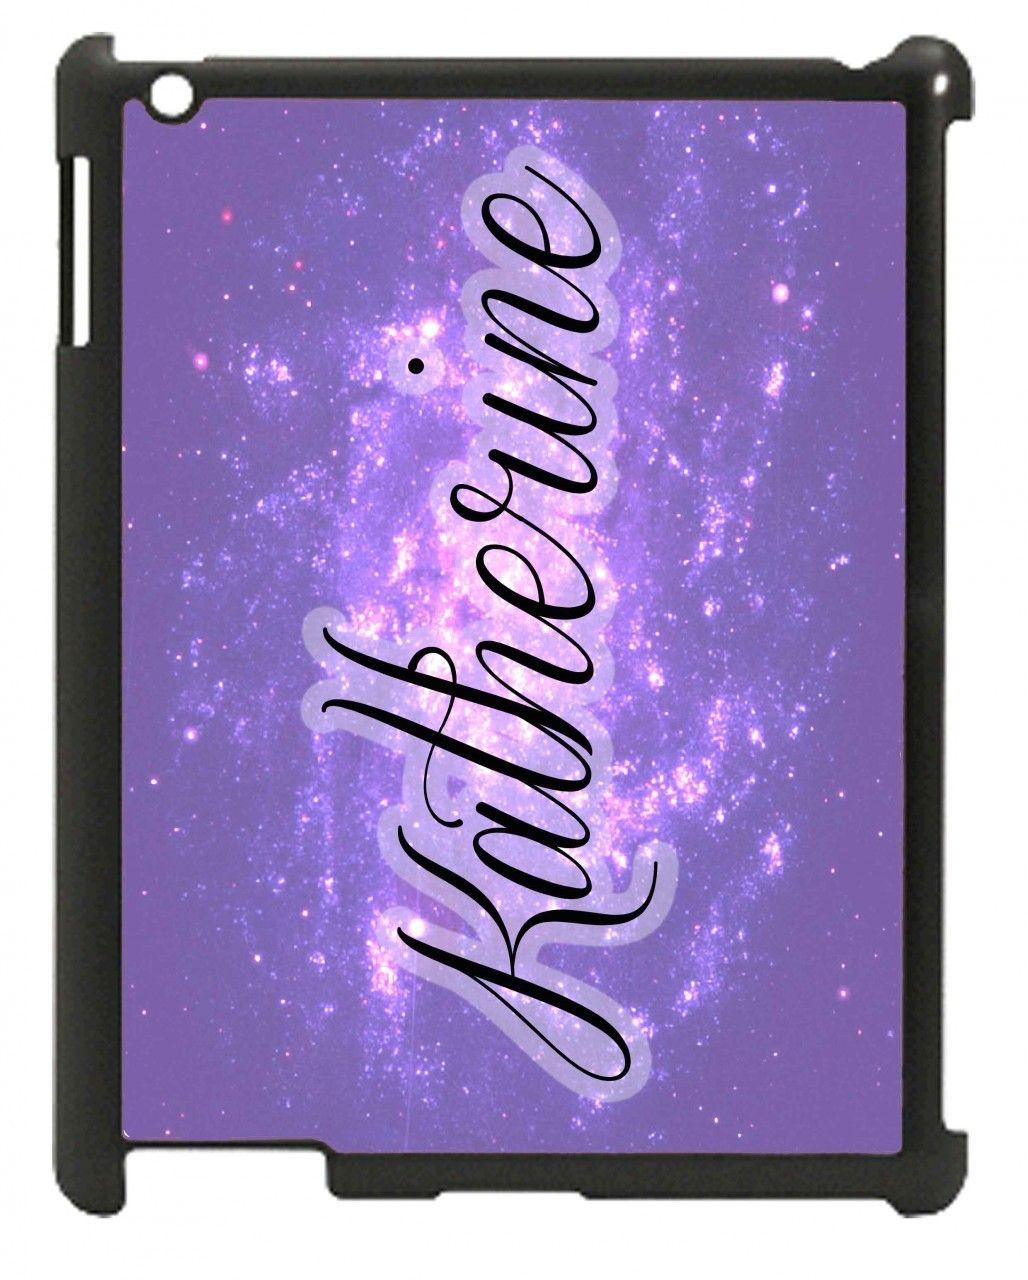 Wordon.com.au - Personalised Purple Galaxy iPad Mini Case, $22.95 (http://www.wordon.com.au/products/personalised-purple-galaxy-ipad-mini-case.html)